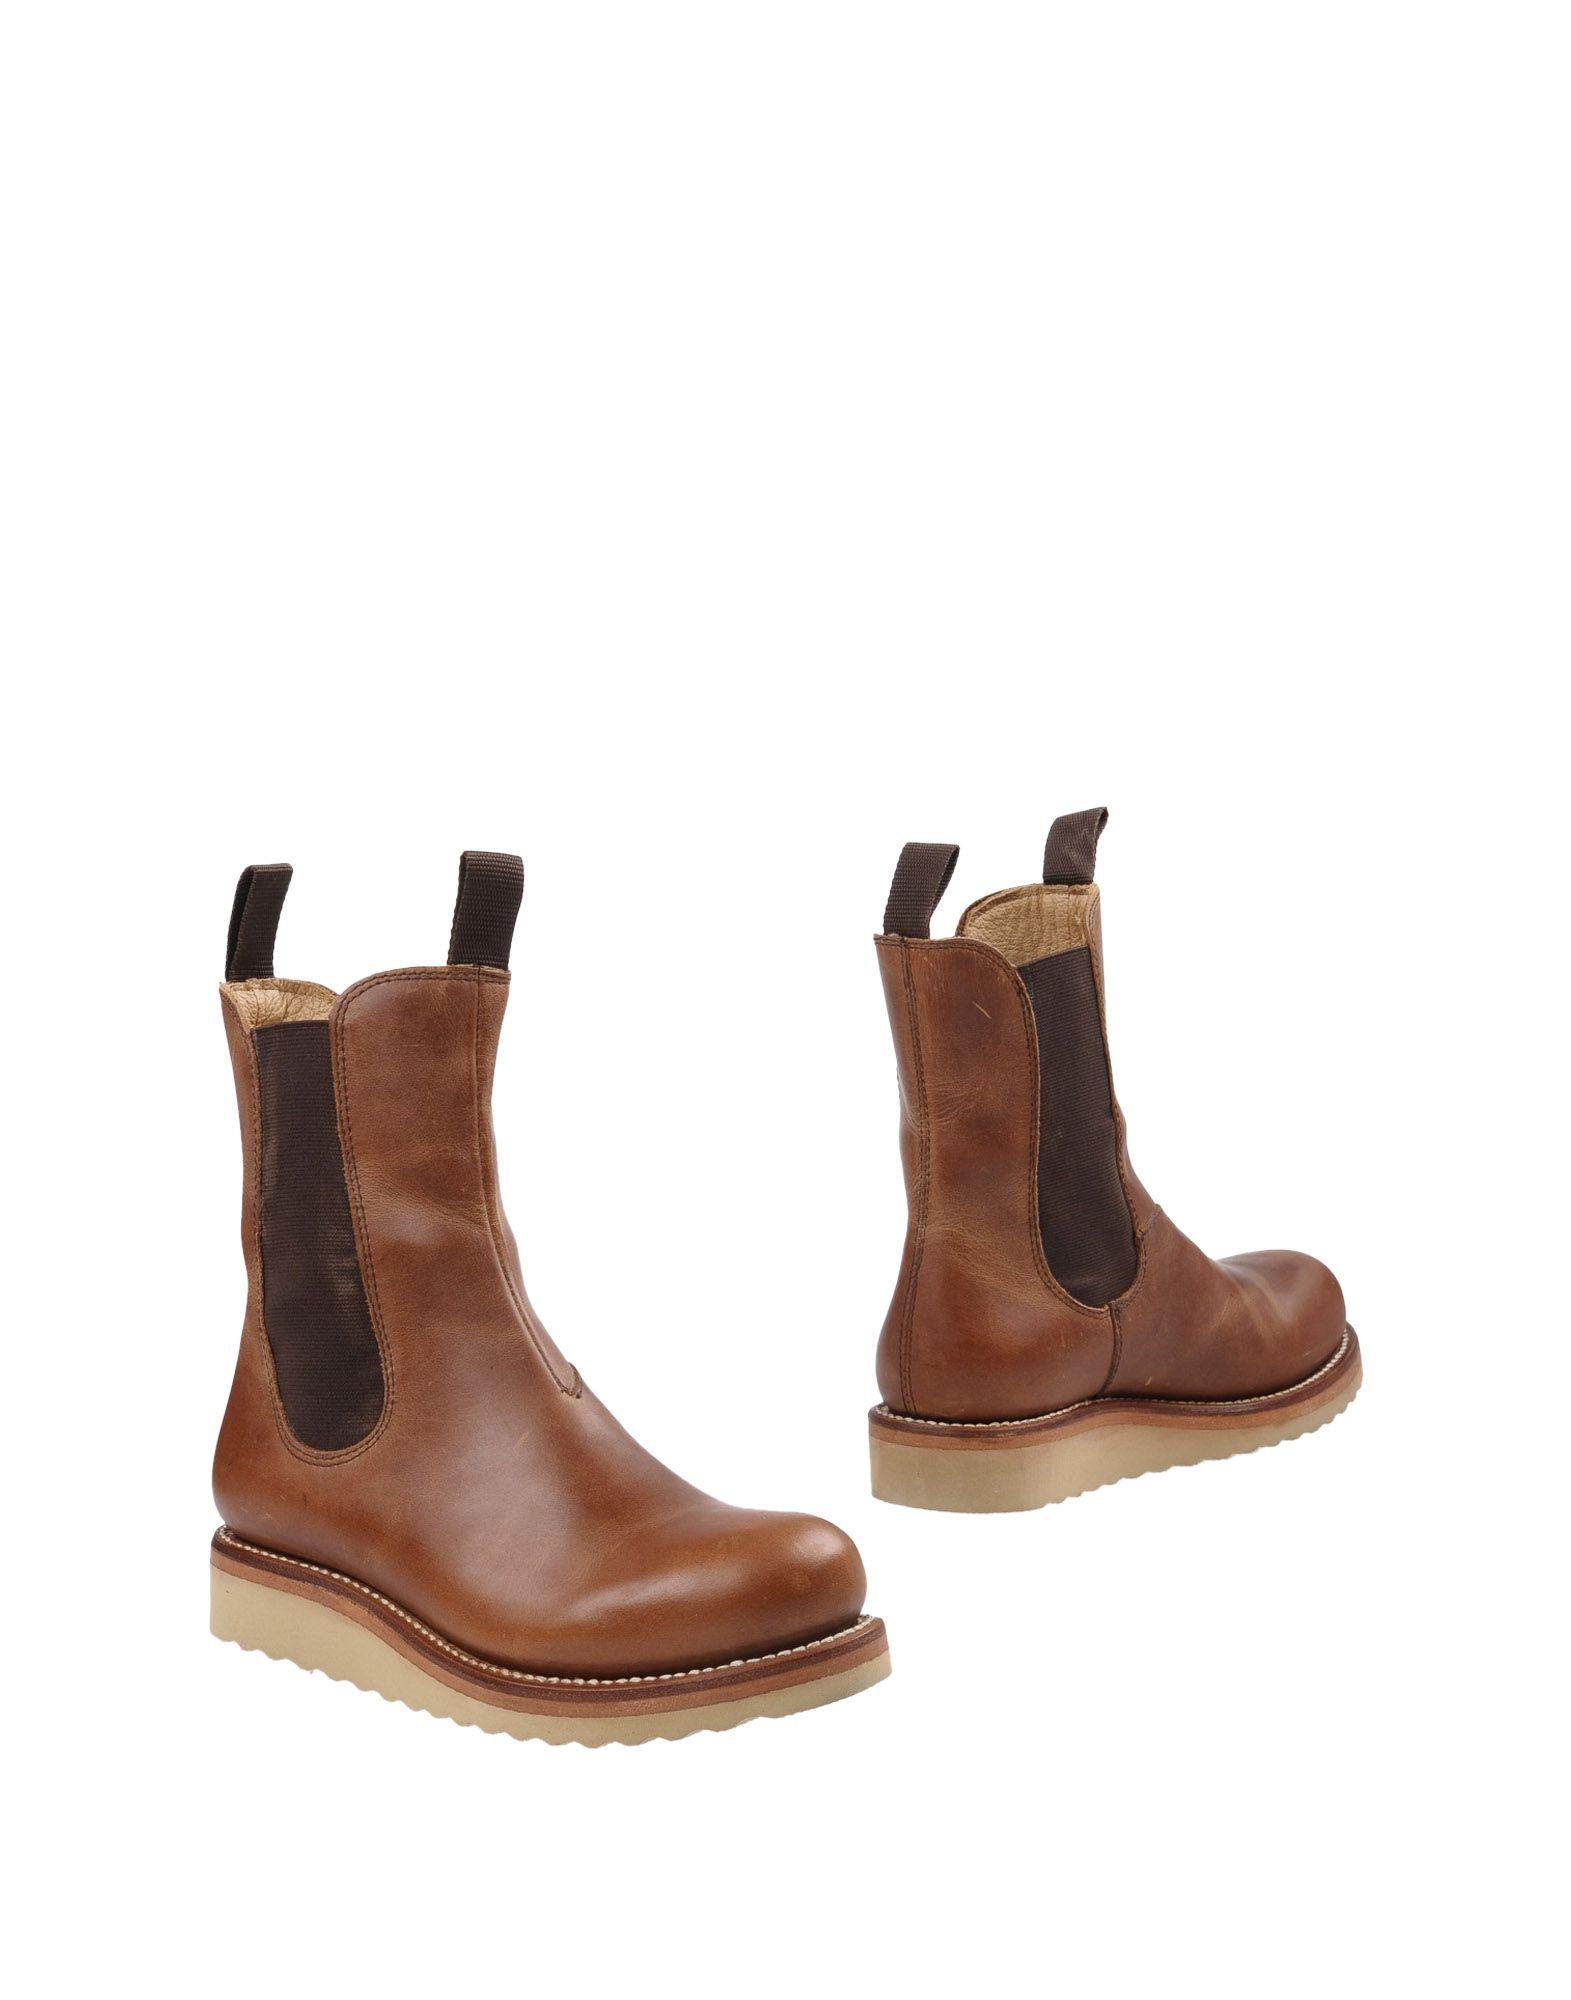 pantofola d 39 oro ankle boots shop at ebates. Black Bedroom Furniture Sets. Home Design Ideas